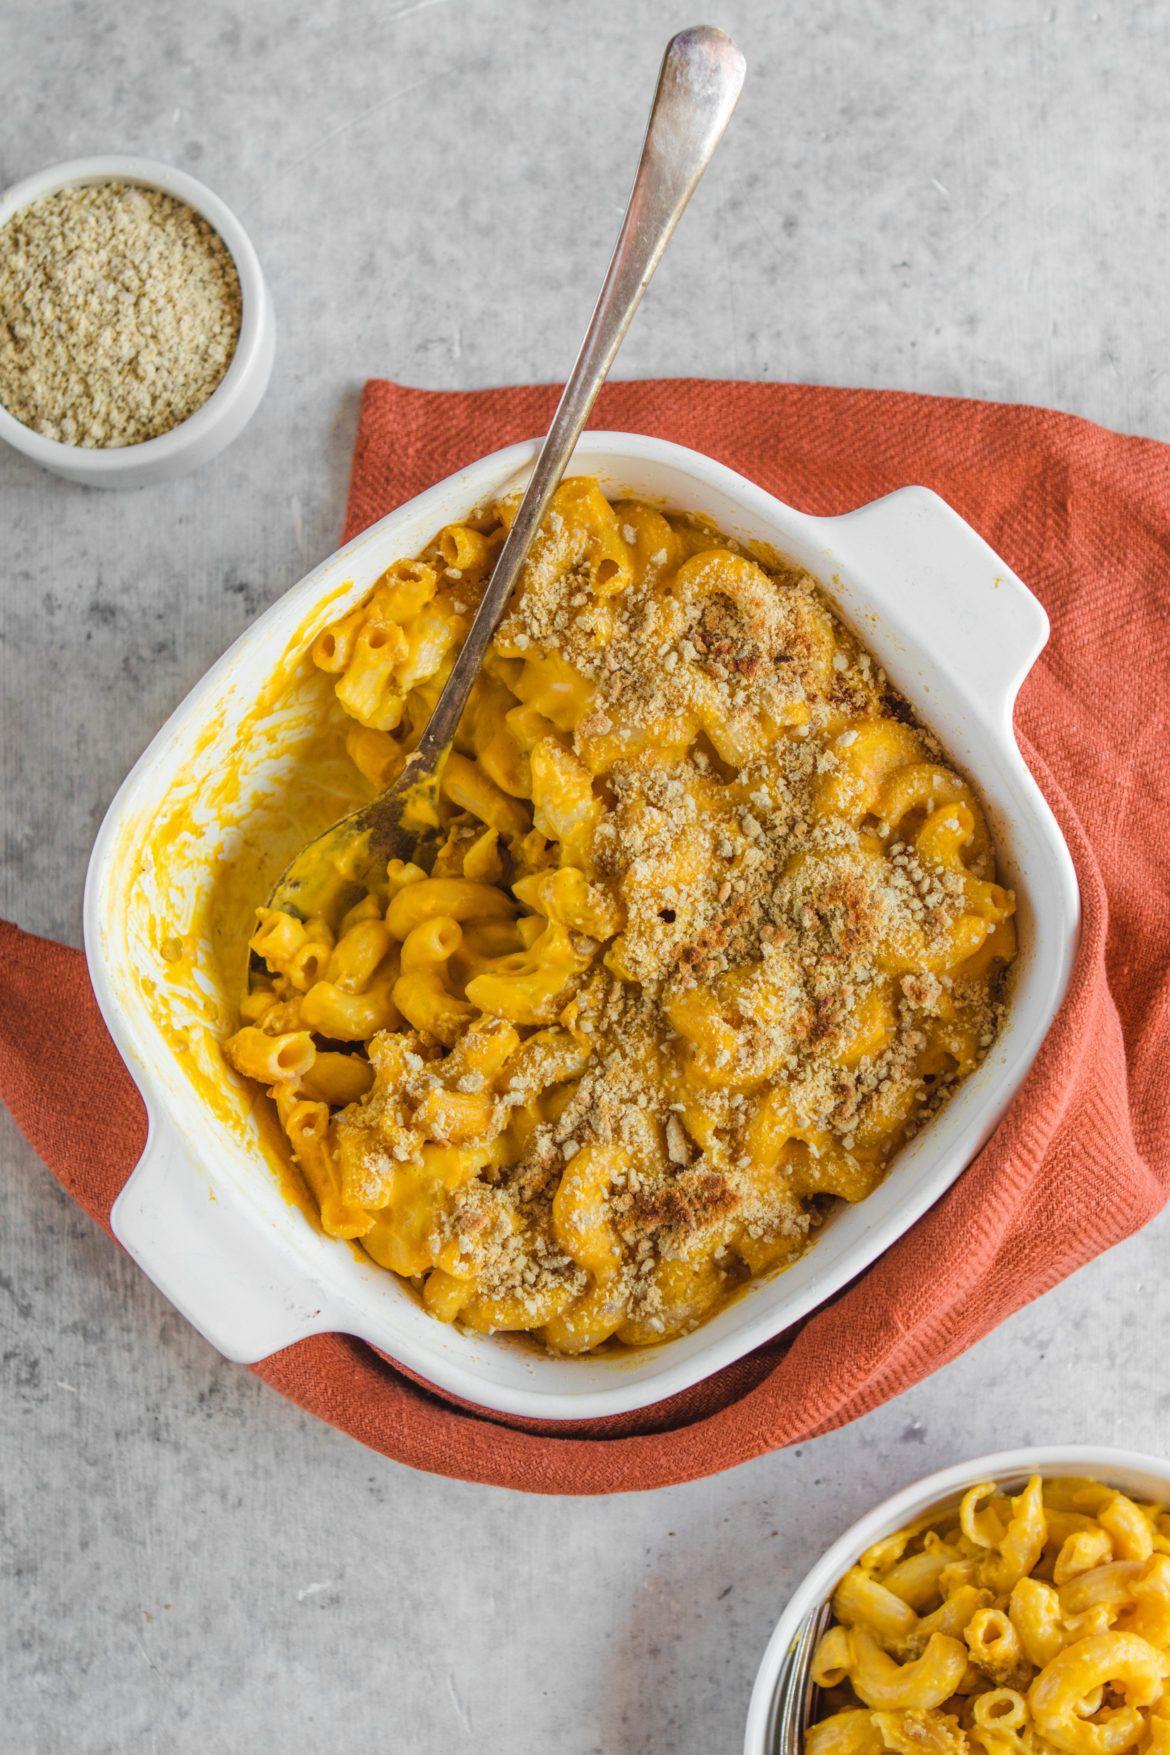 Baked Vegan Mac And Cheese Gluten Free Nut Free Recipe